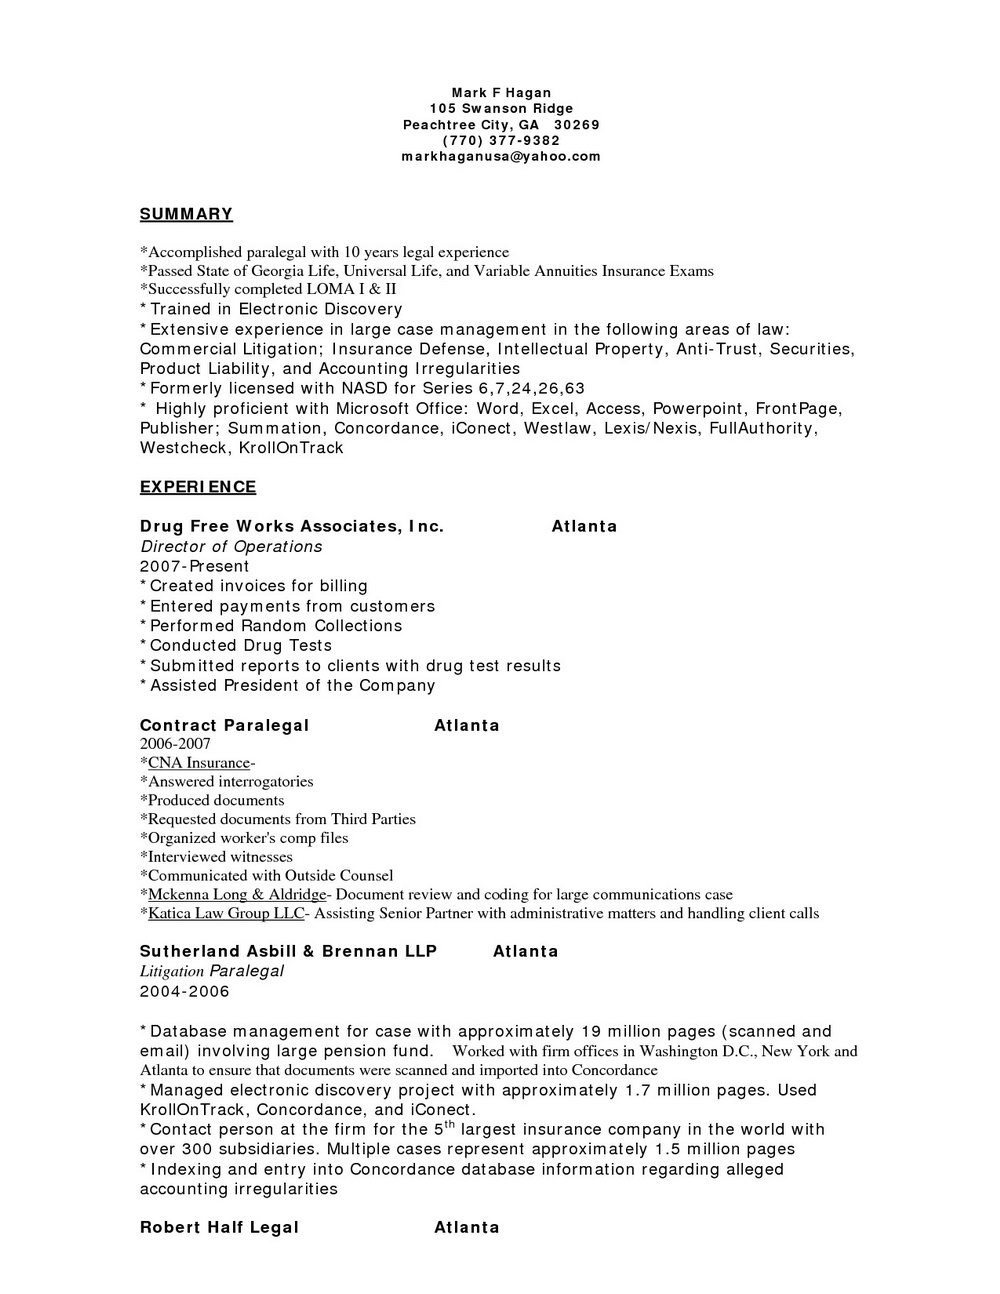 Resume Writing Service Atlanta